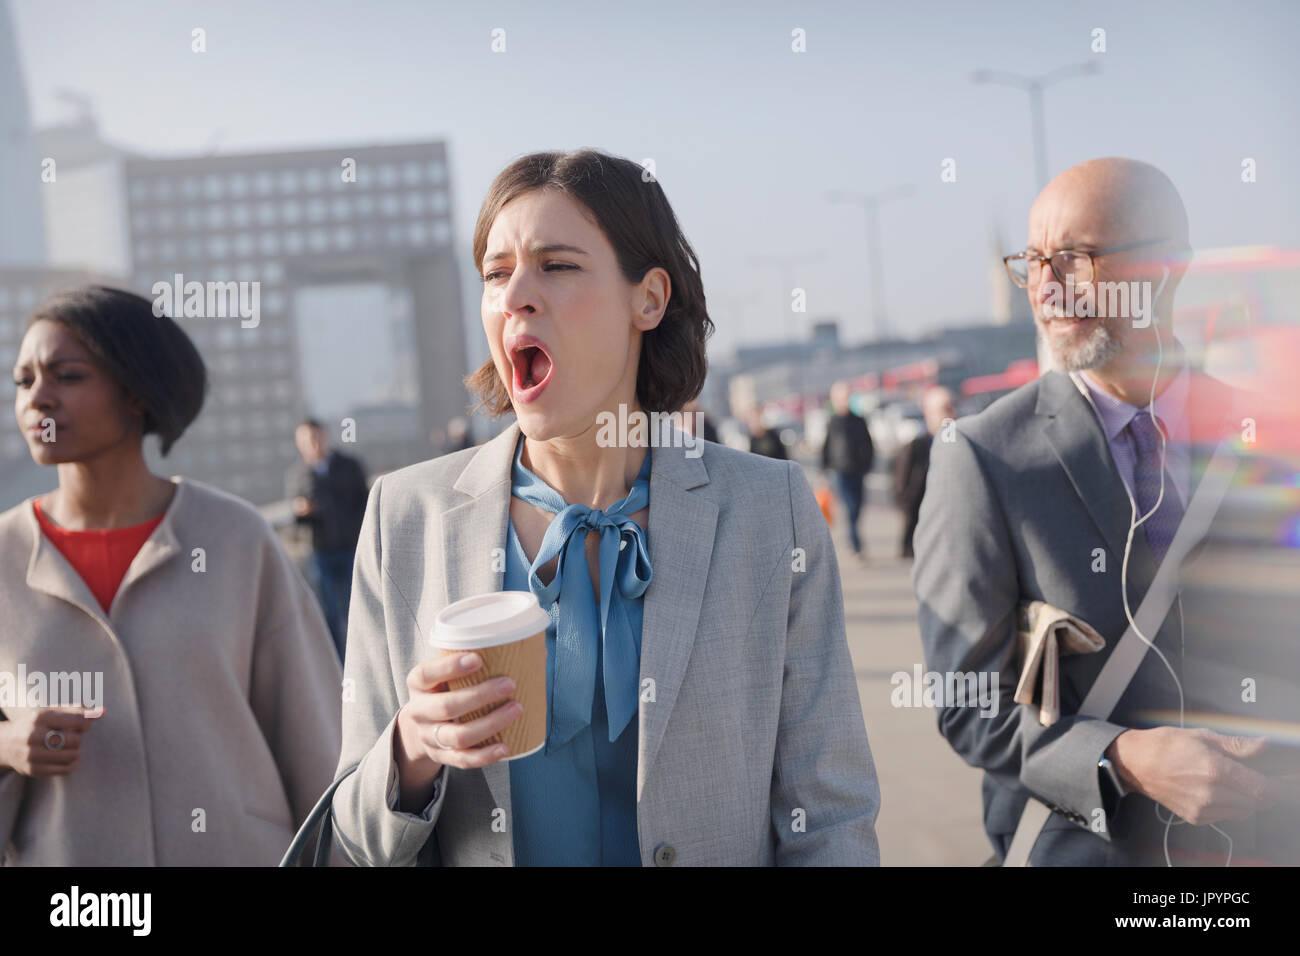 Tired businesswoman with coffee yawning on sunny morning urban pedestrian bridge - Stock Image